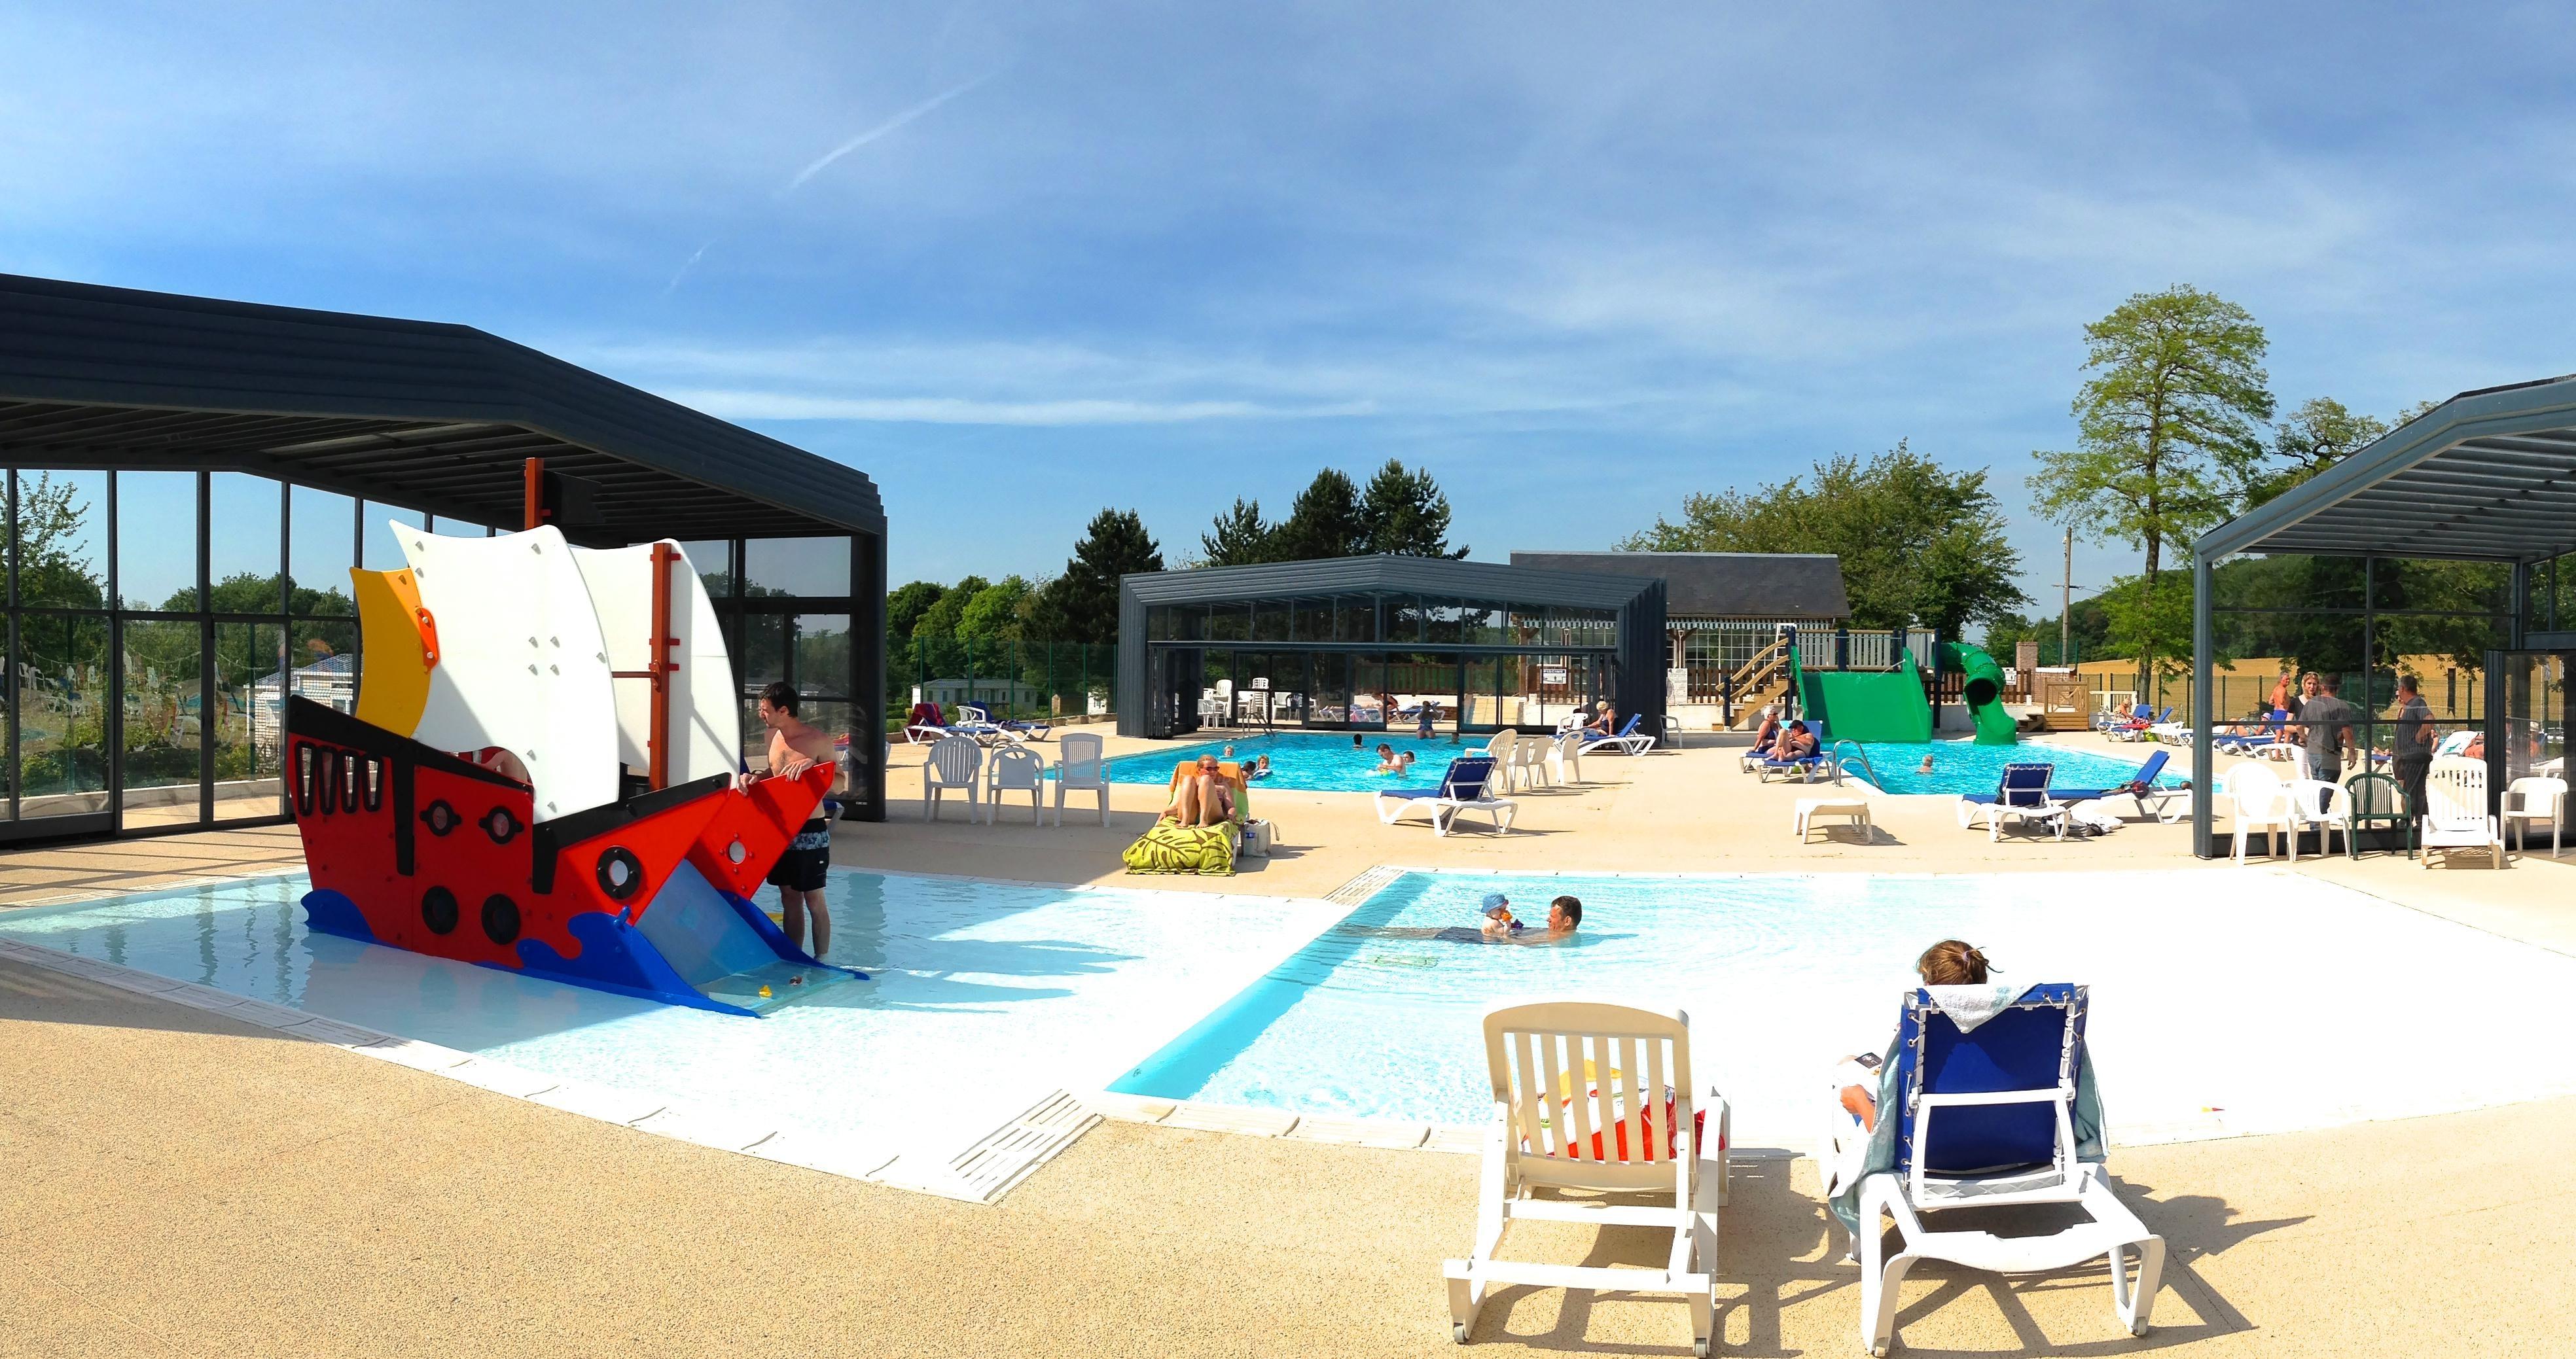 Kinderbad camping Chateau de Drancourt